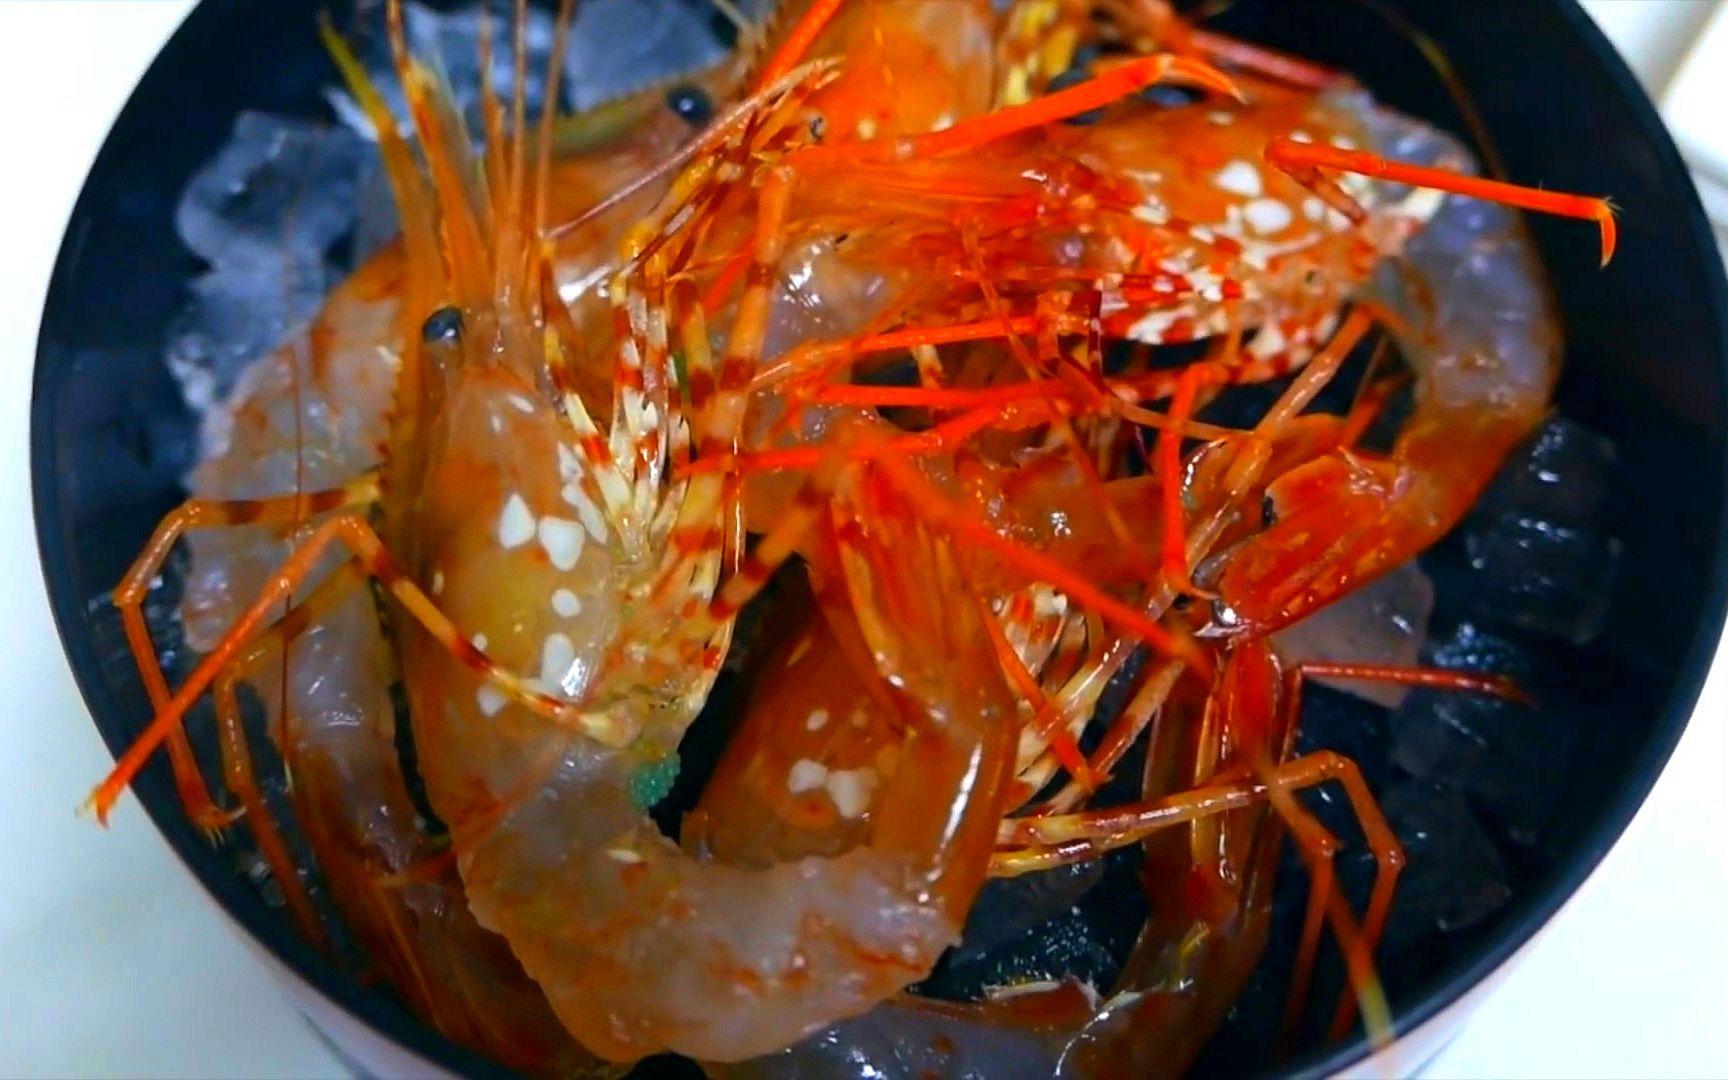 日本北海道路邊小吃 - 藍蛋蝦 海螺 蟹 魚 蛤蜊 海鮮刺身_嗶哩嗶哩 (゜-゜)つロ 干杯~-bilibili